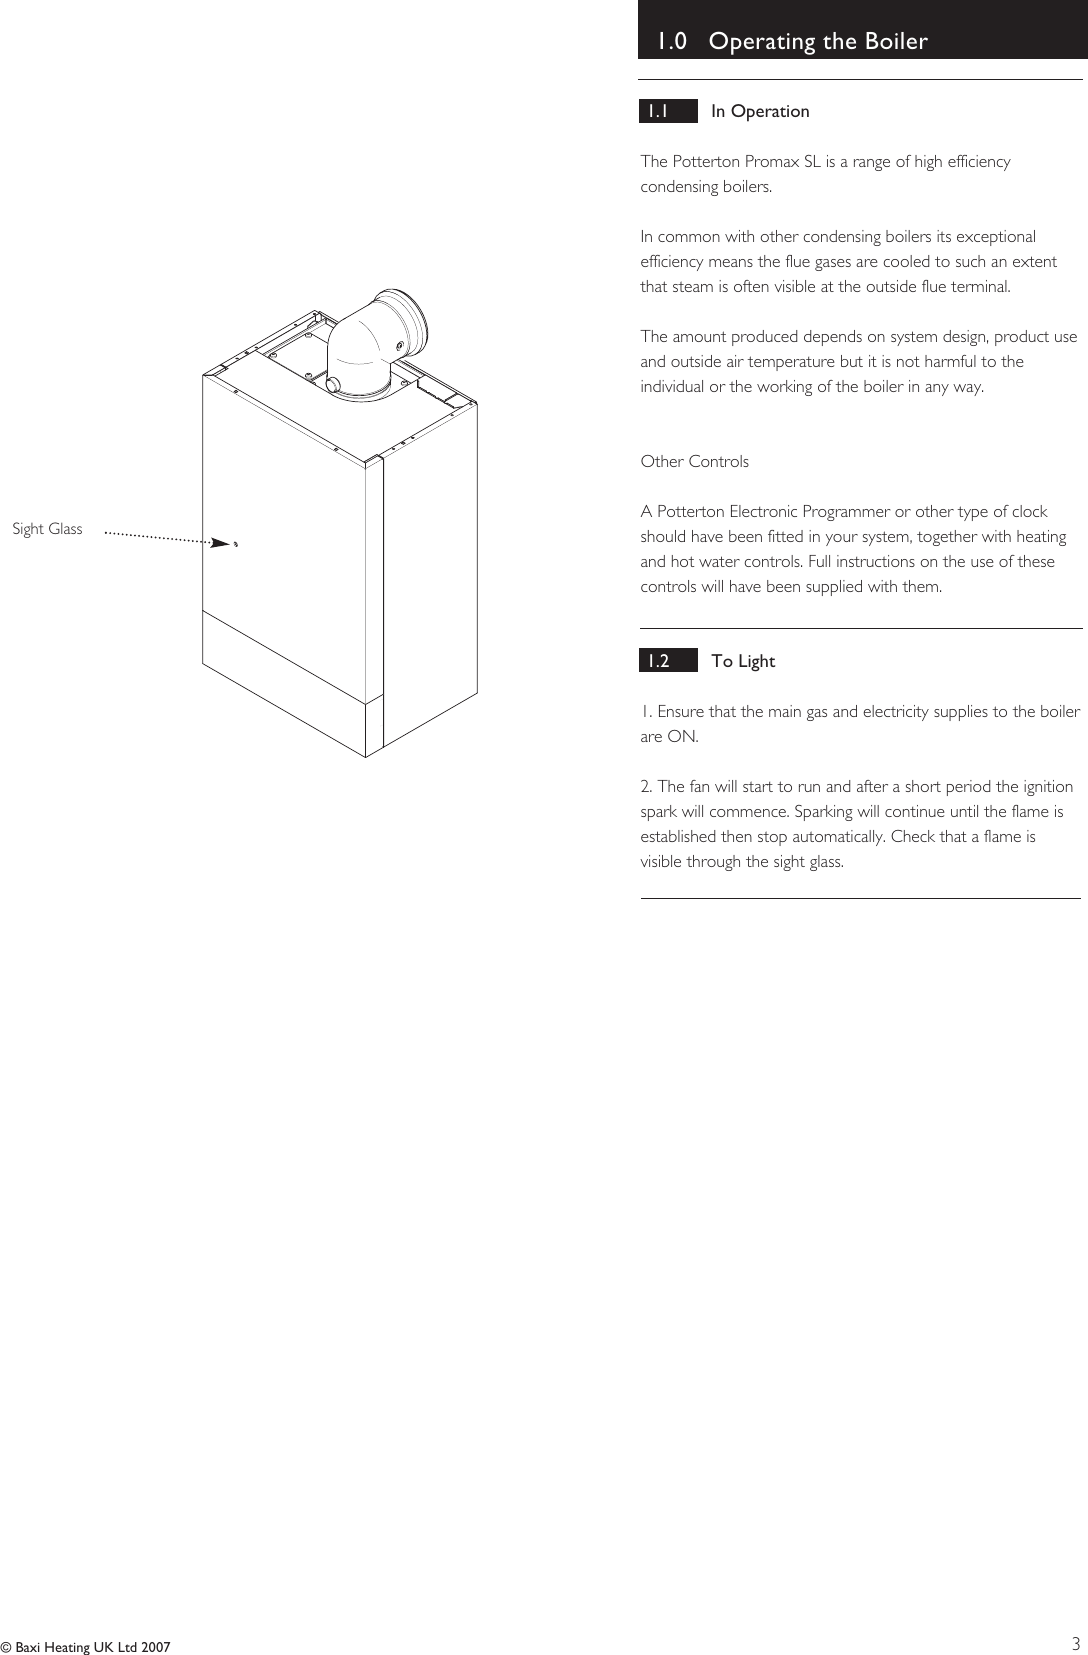 Baxi potterton promax sl users manual 5121909 page 3 of 12 baxi potterton baxi potterton promax sl cheapraybanclubmaster Choice Image